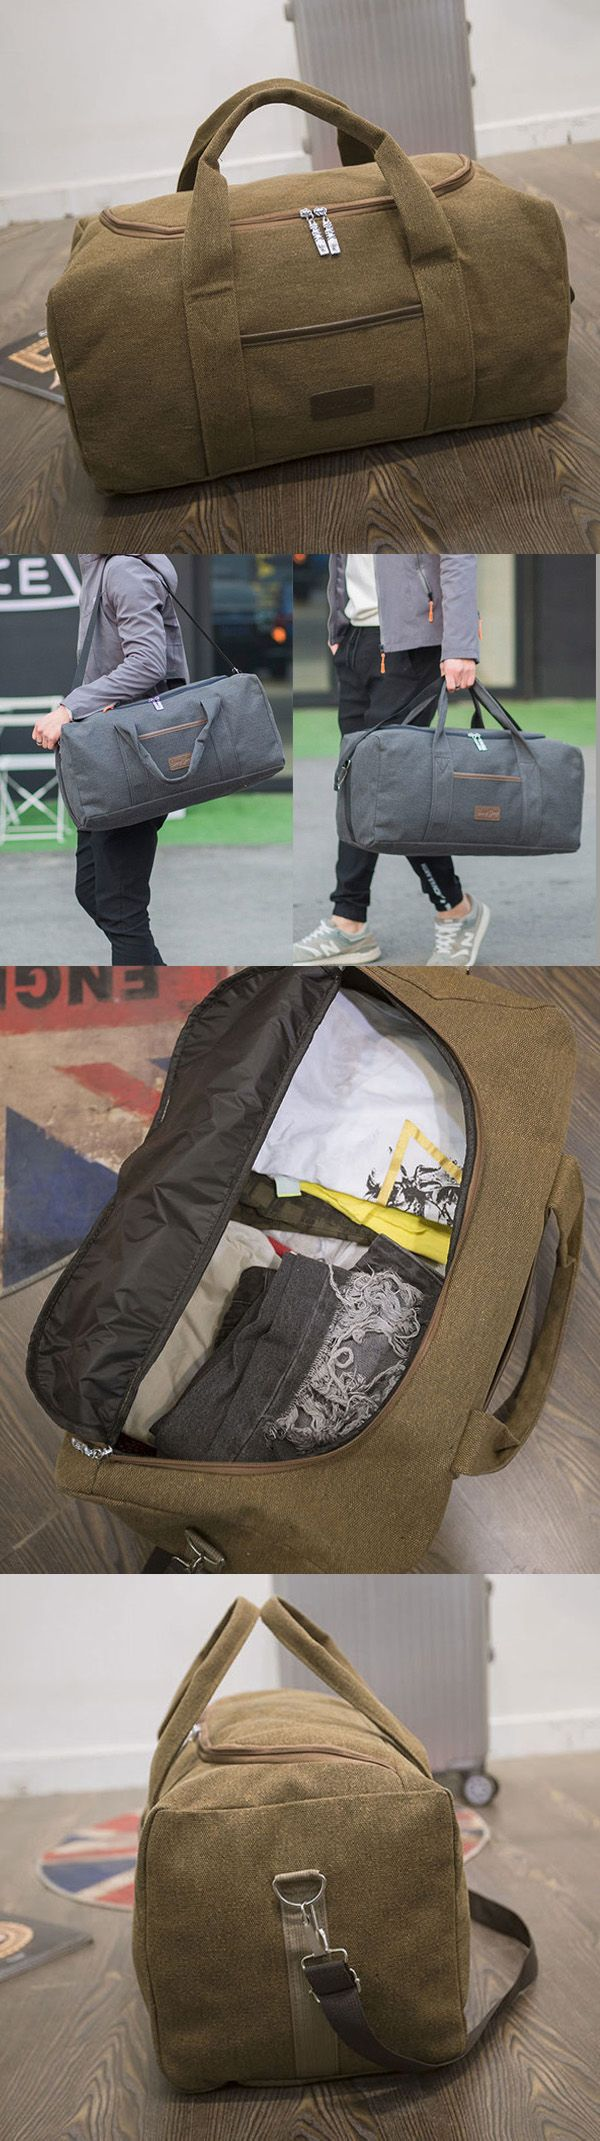 $16.39  40L Big Capacity Travel Crossbody Bag, Outdoor Dual-use Canvas Handbag For Men,Travel Bags For Men, Men's Travel Bags